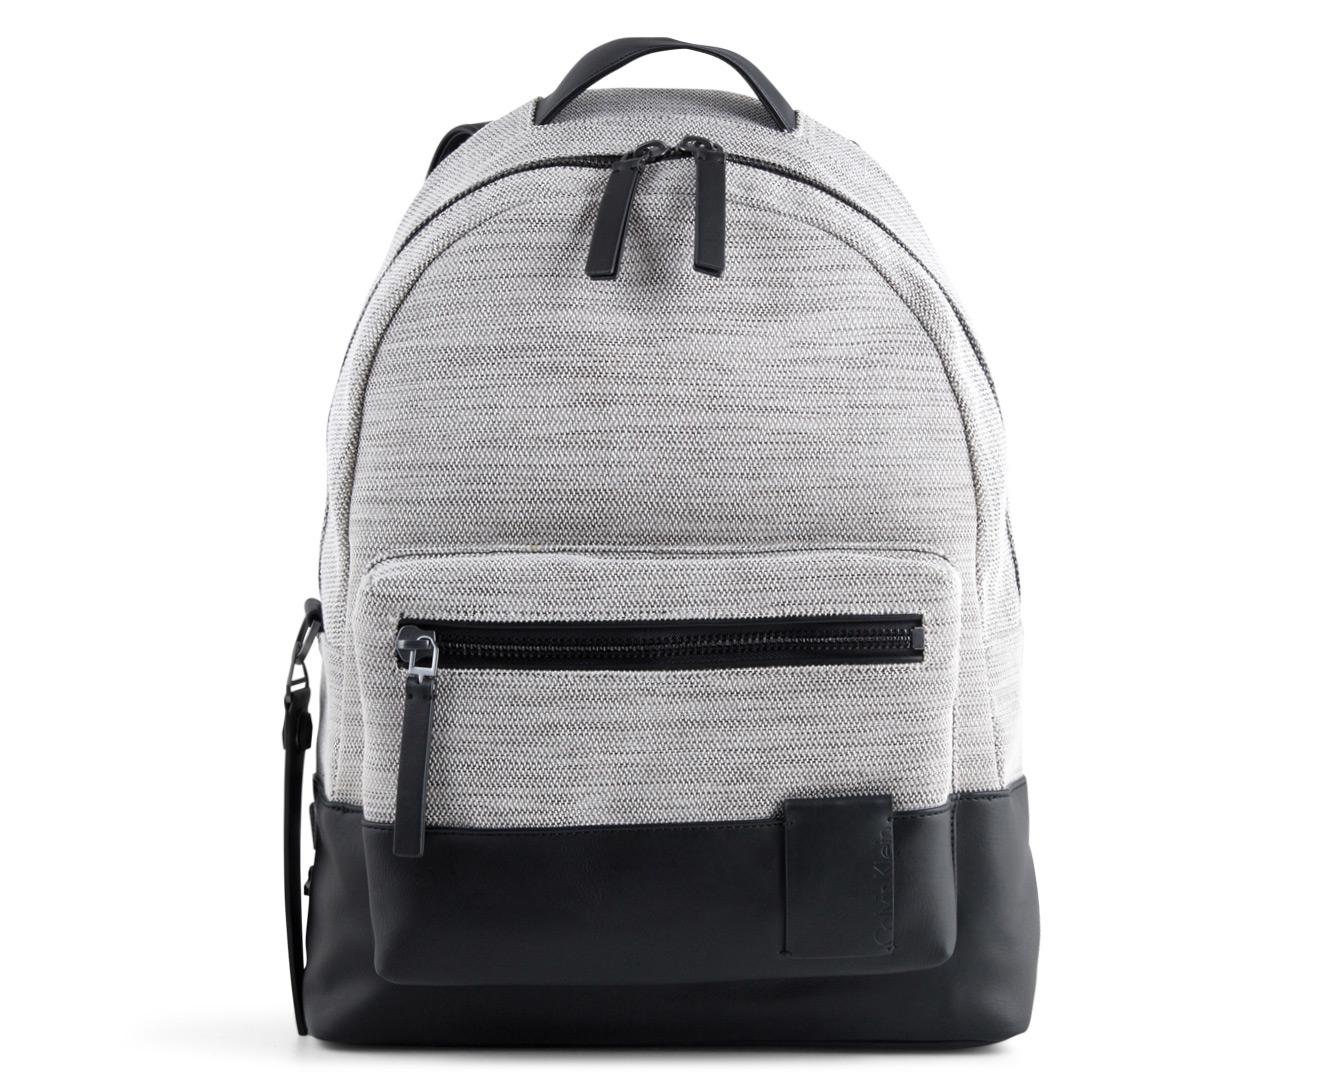 fbfd6f6a8 Calvin Klein Jeans Men's Mechanical Weave Campus Backpack - Sand |  Catch.com.au